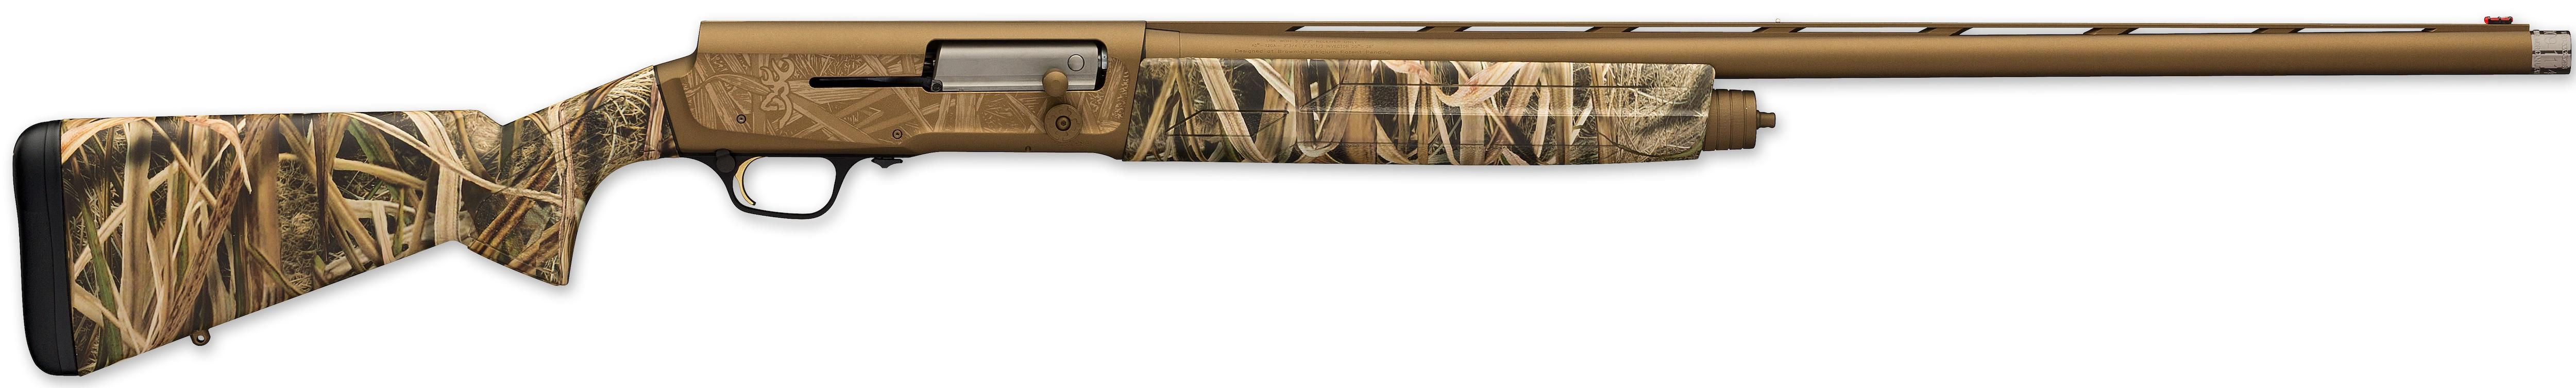 2017 Shotguns -- Browning A5